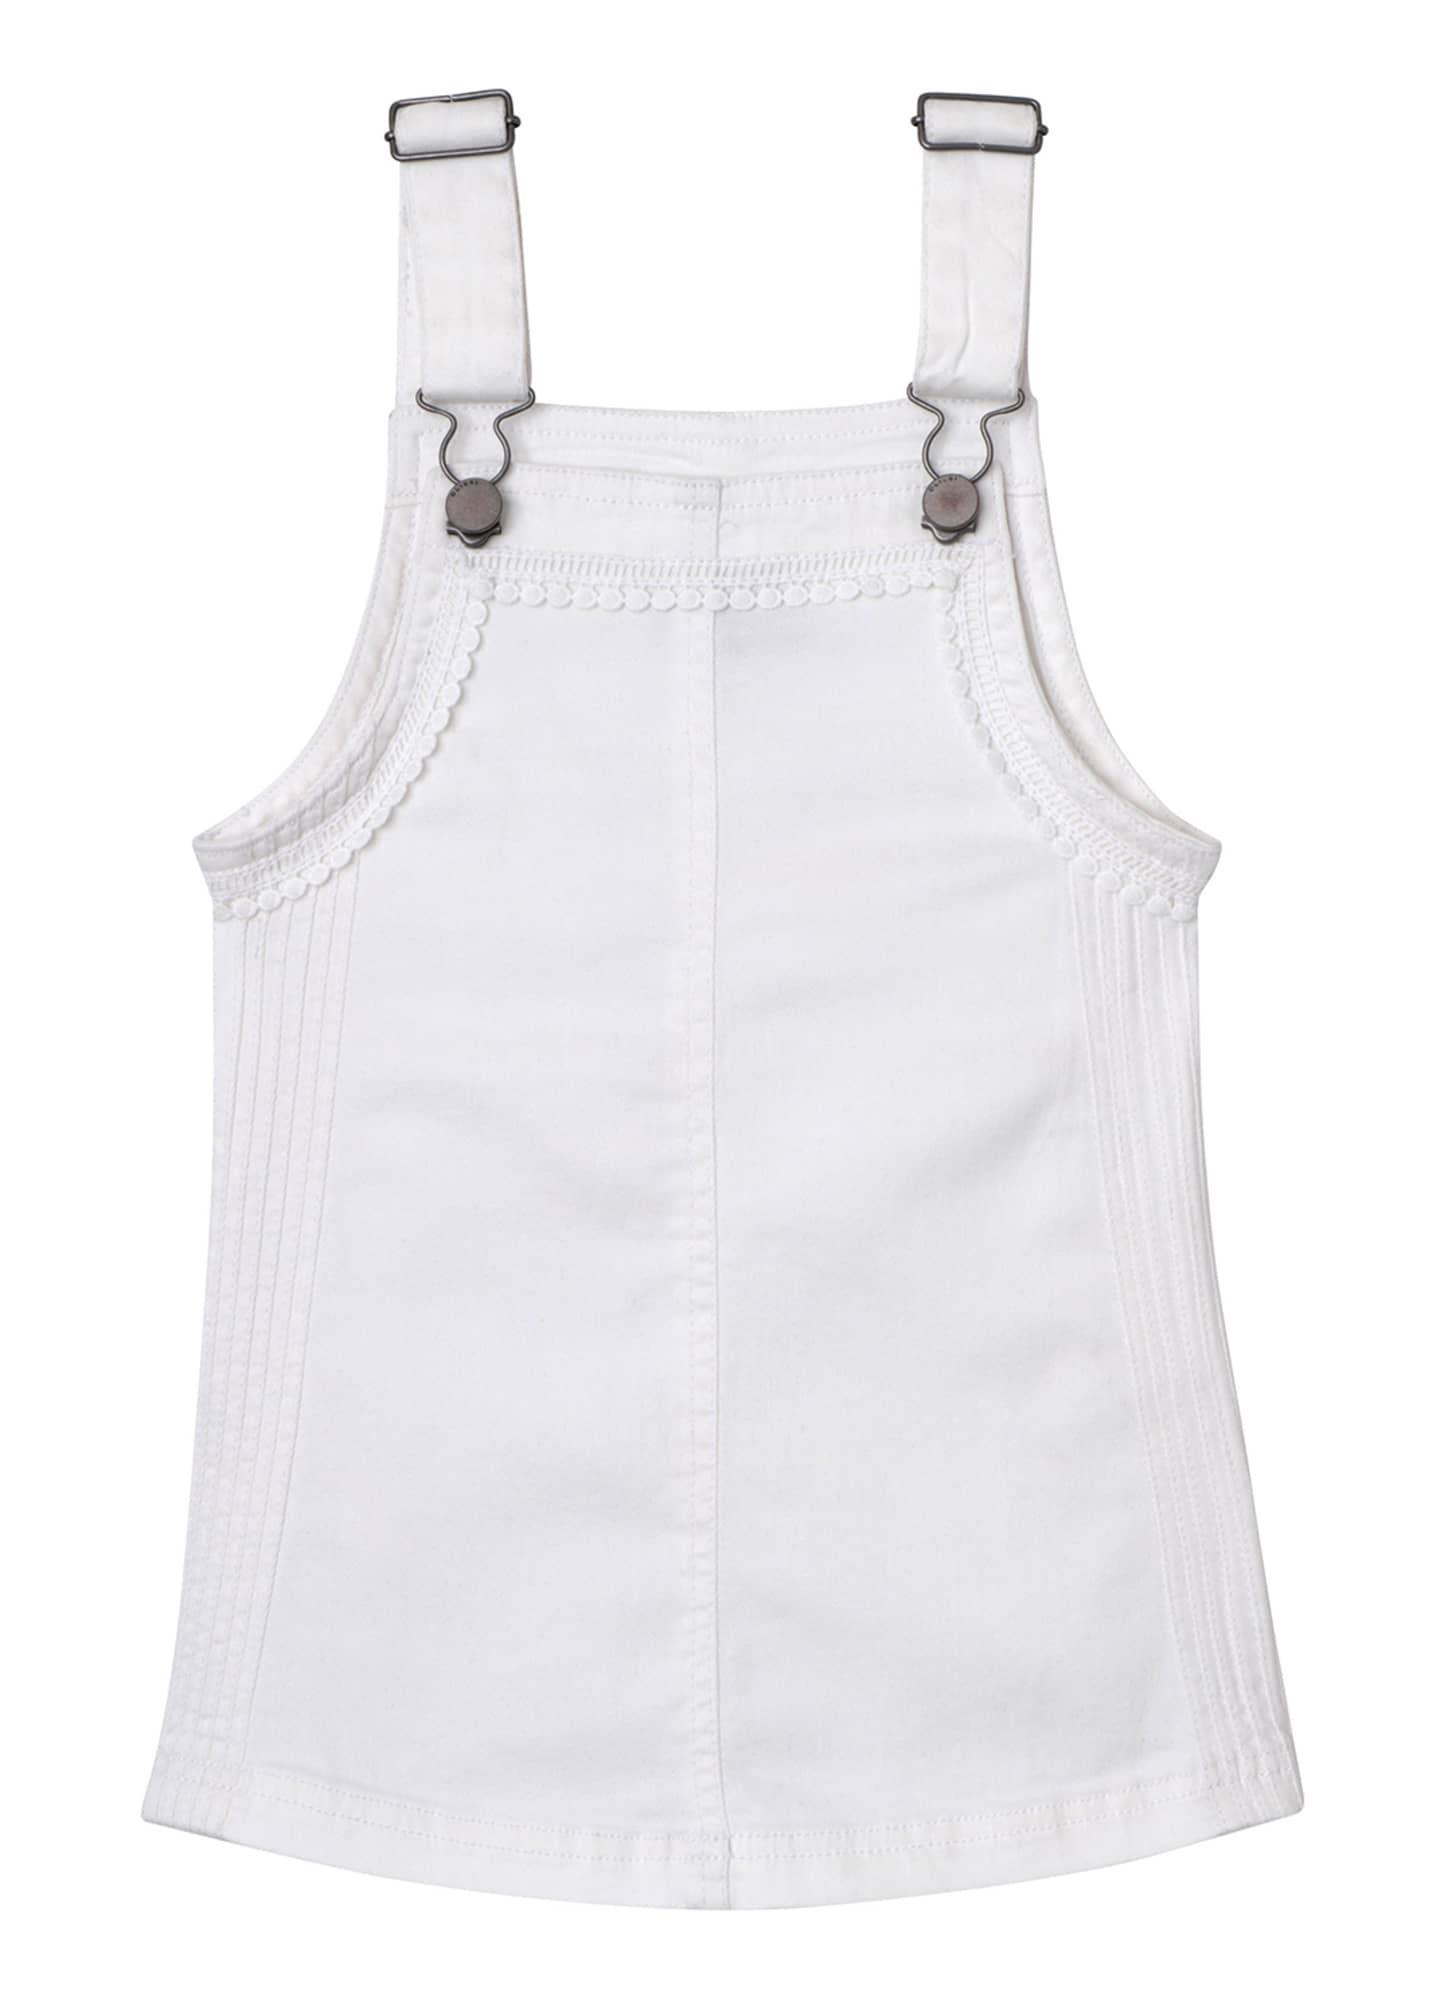 DL1961 Premium Denim Penelope Overall Pinafore Dress, Size